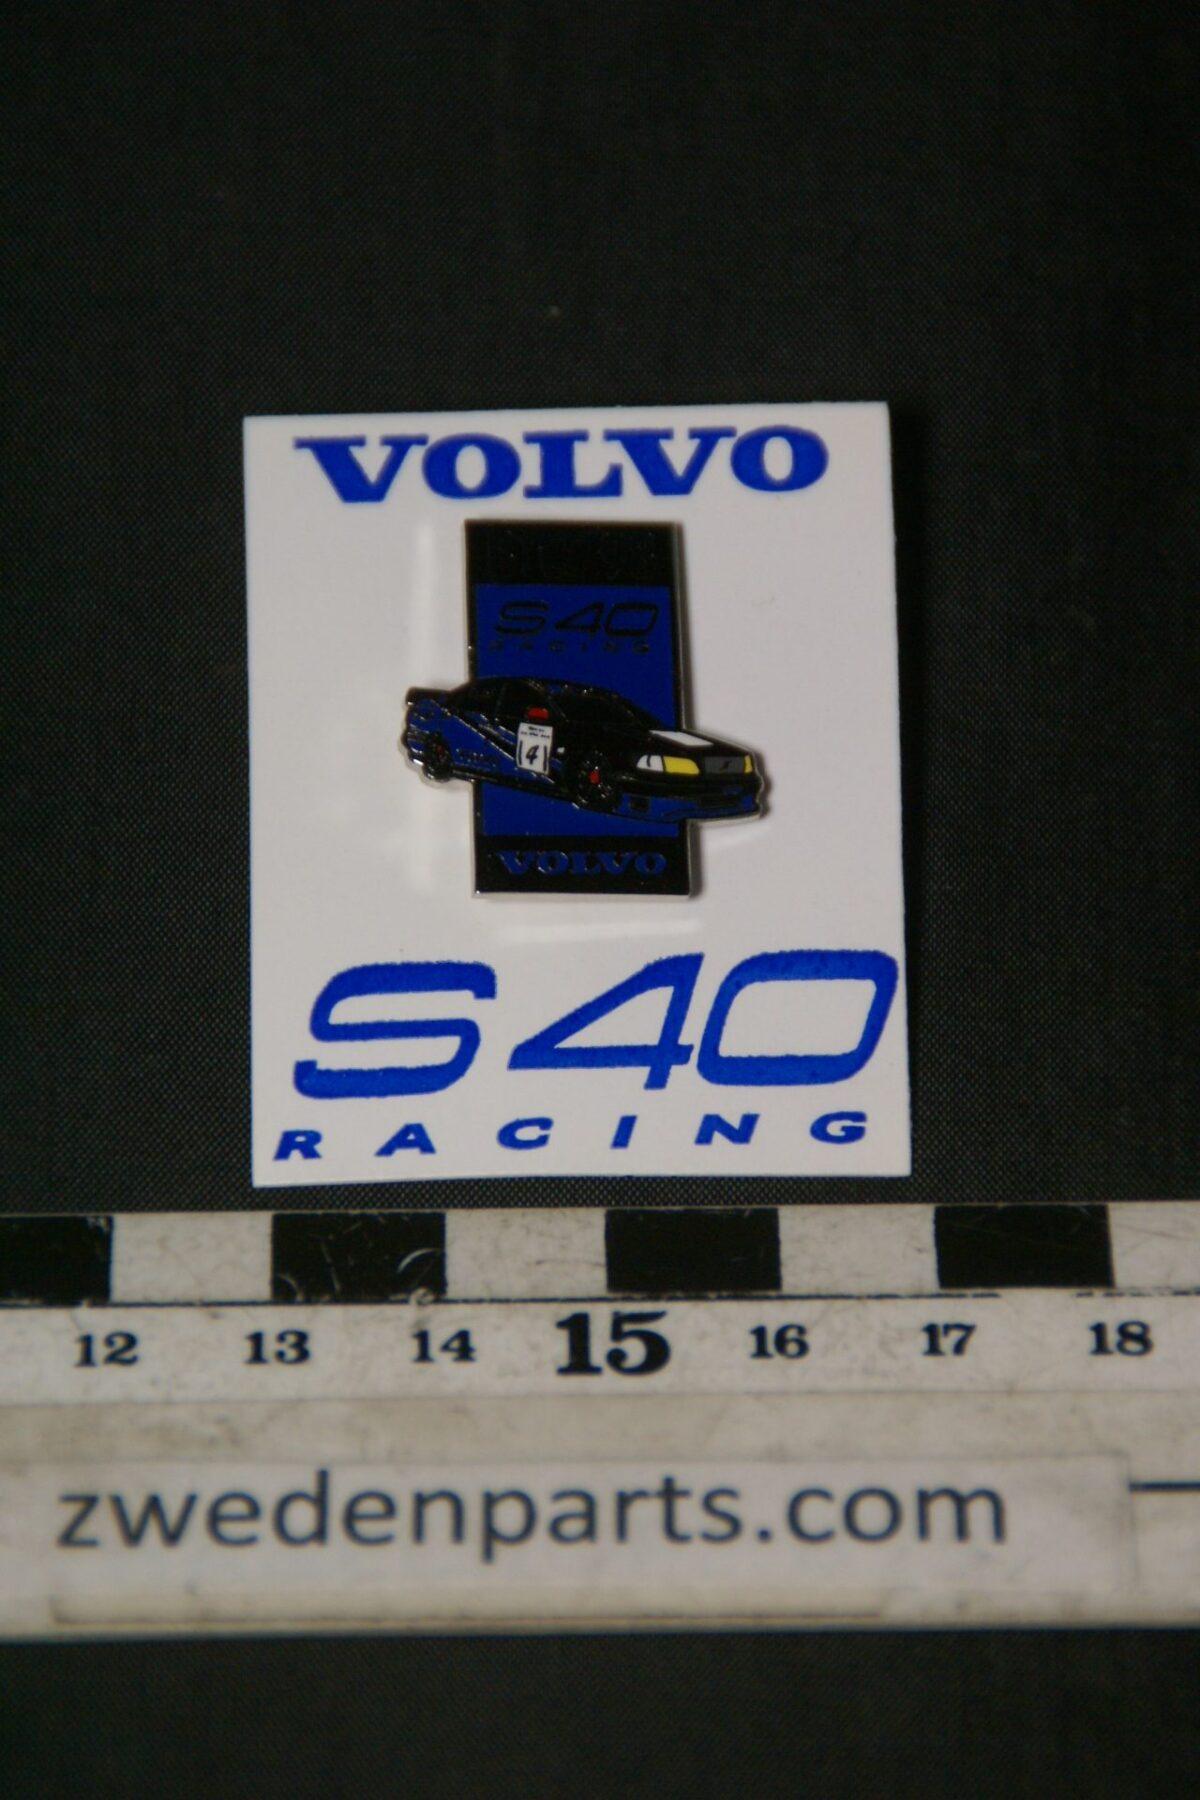 DSC04178 pin Volvo S40 Racing Mint